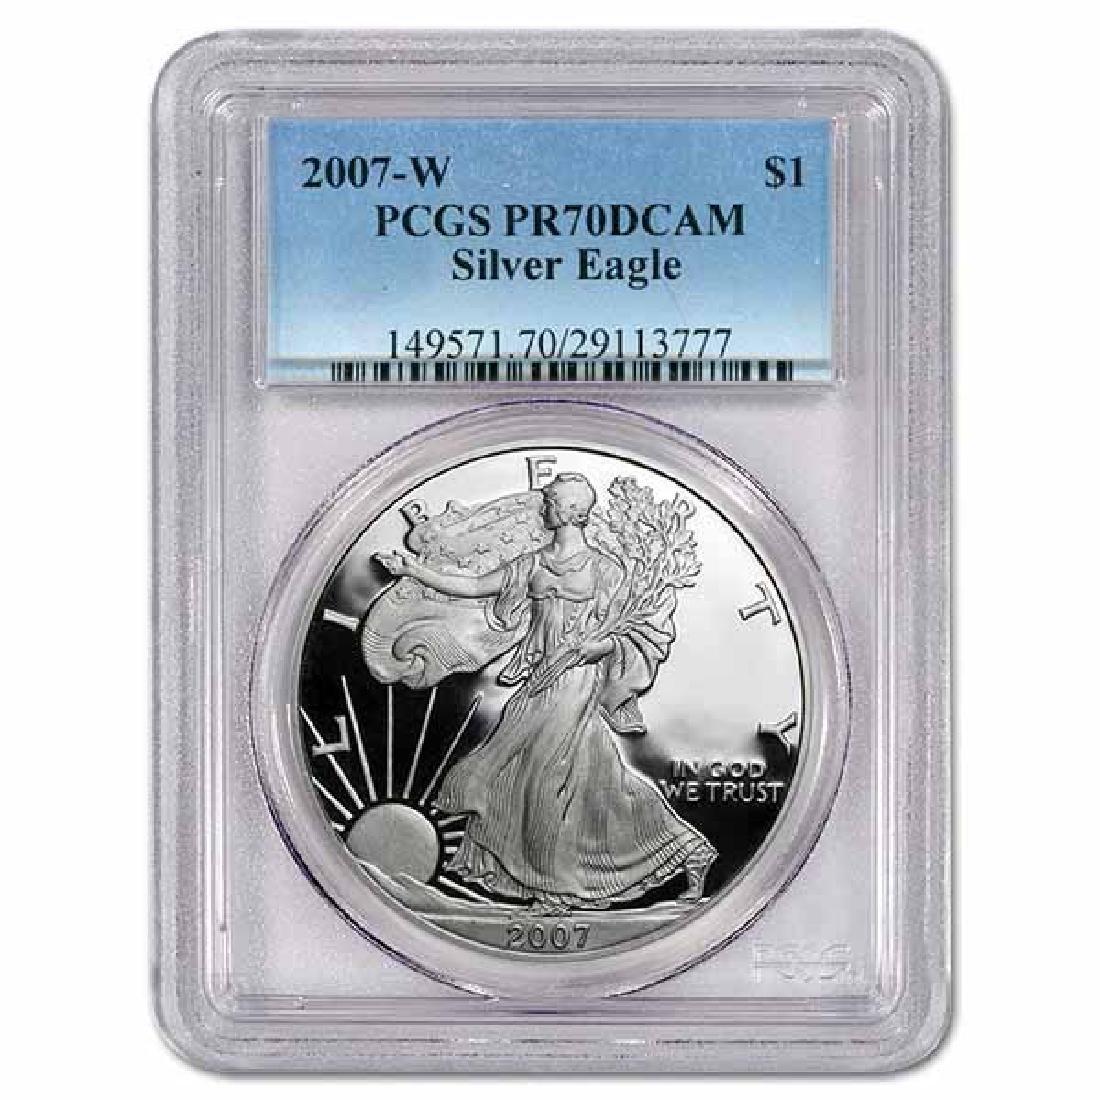 Certified Proof Silver Eagle 2007-W PR70DCAM PCGS